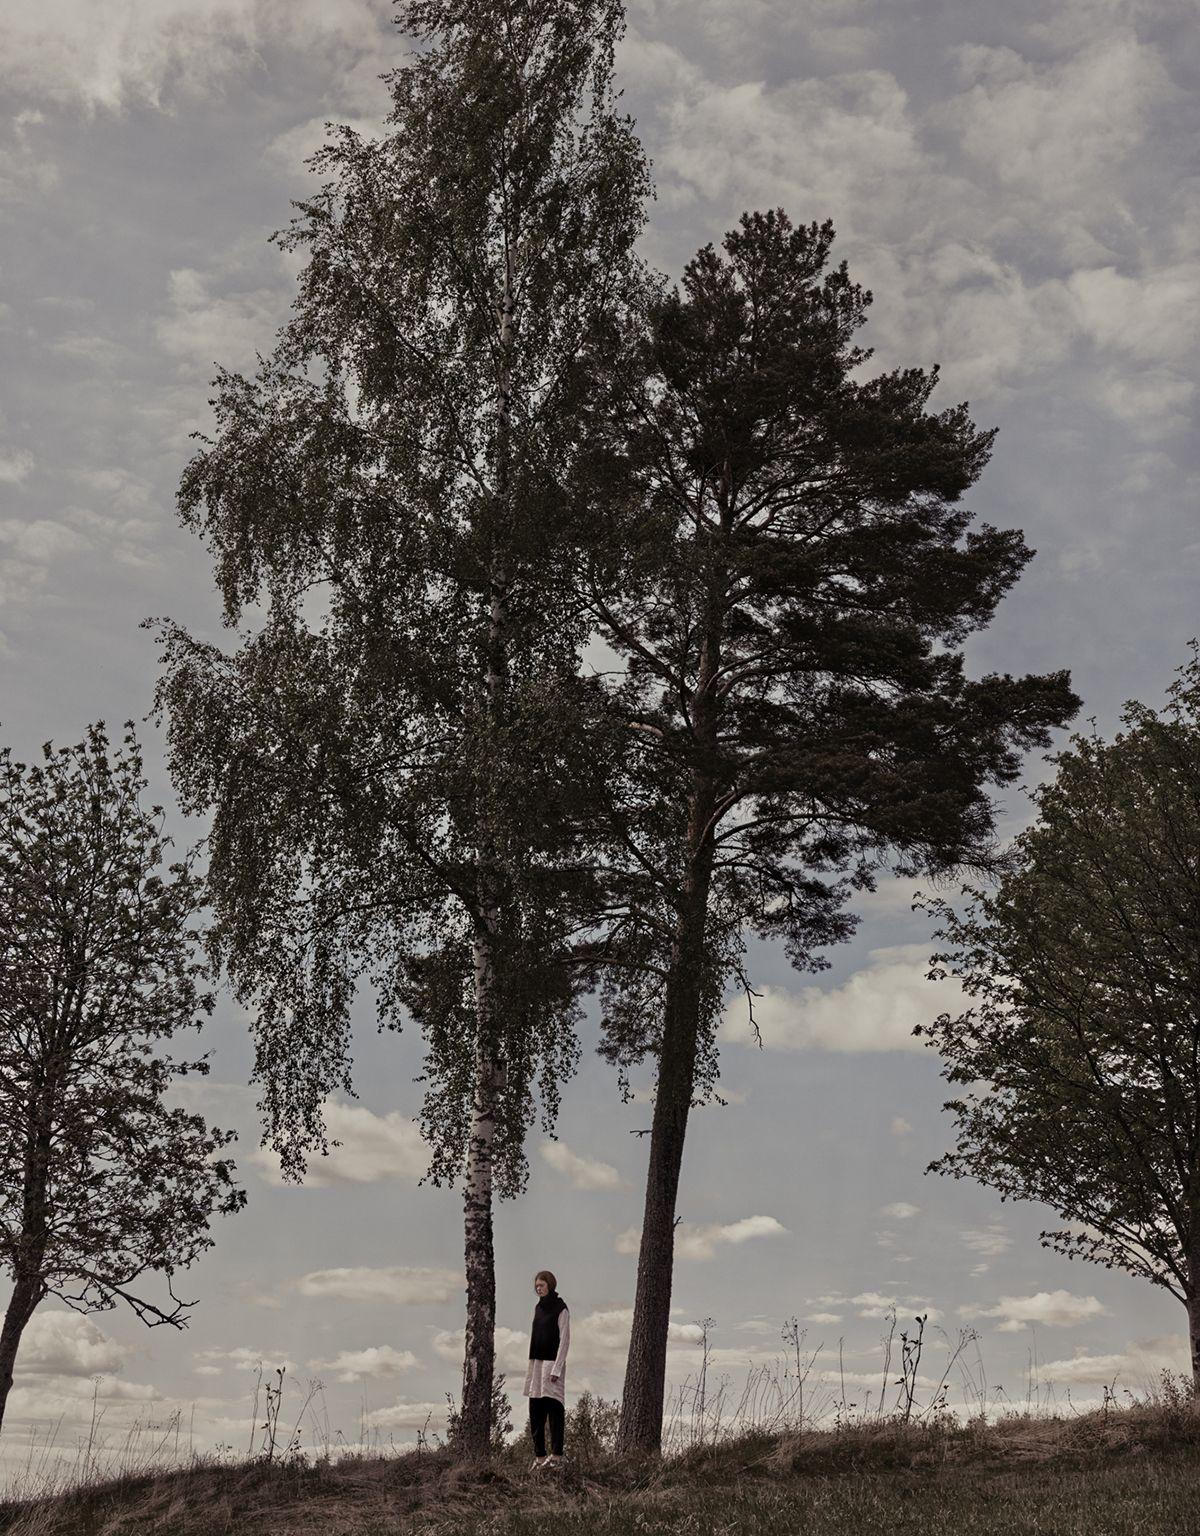 Nygards Anna Autumn 2016 nygårdsanna.se